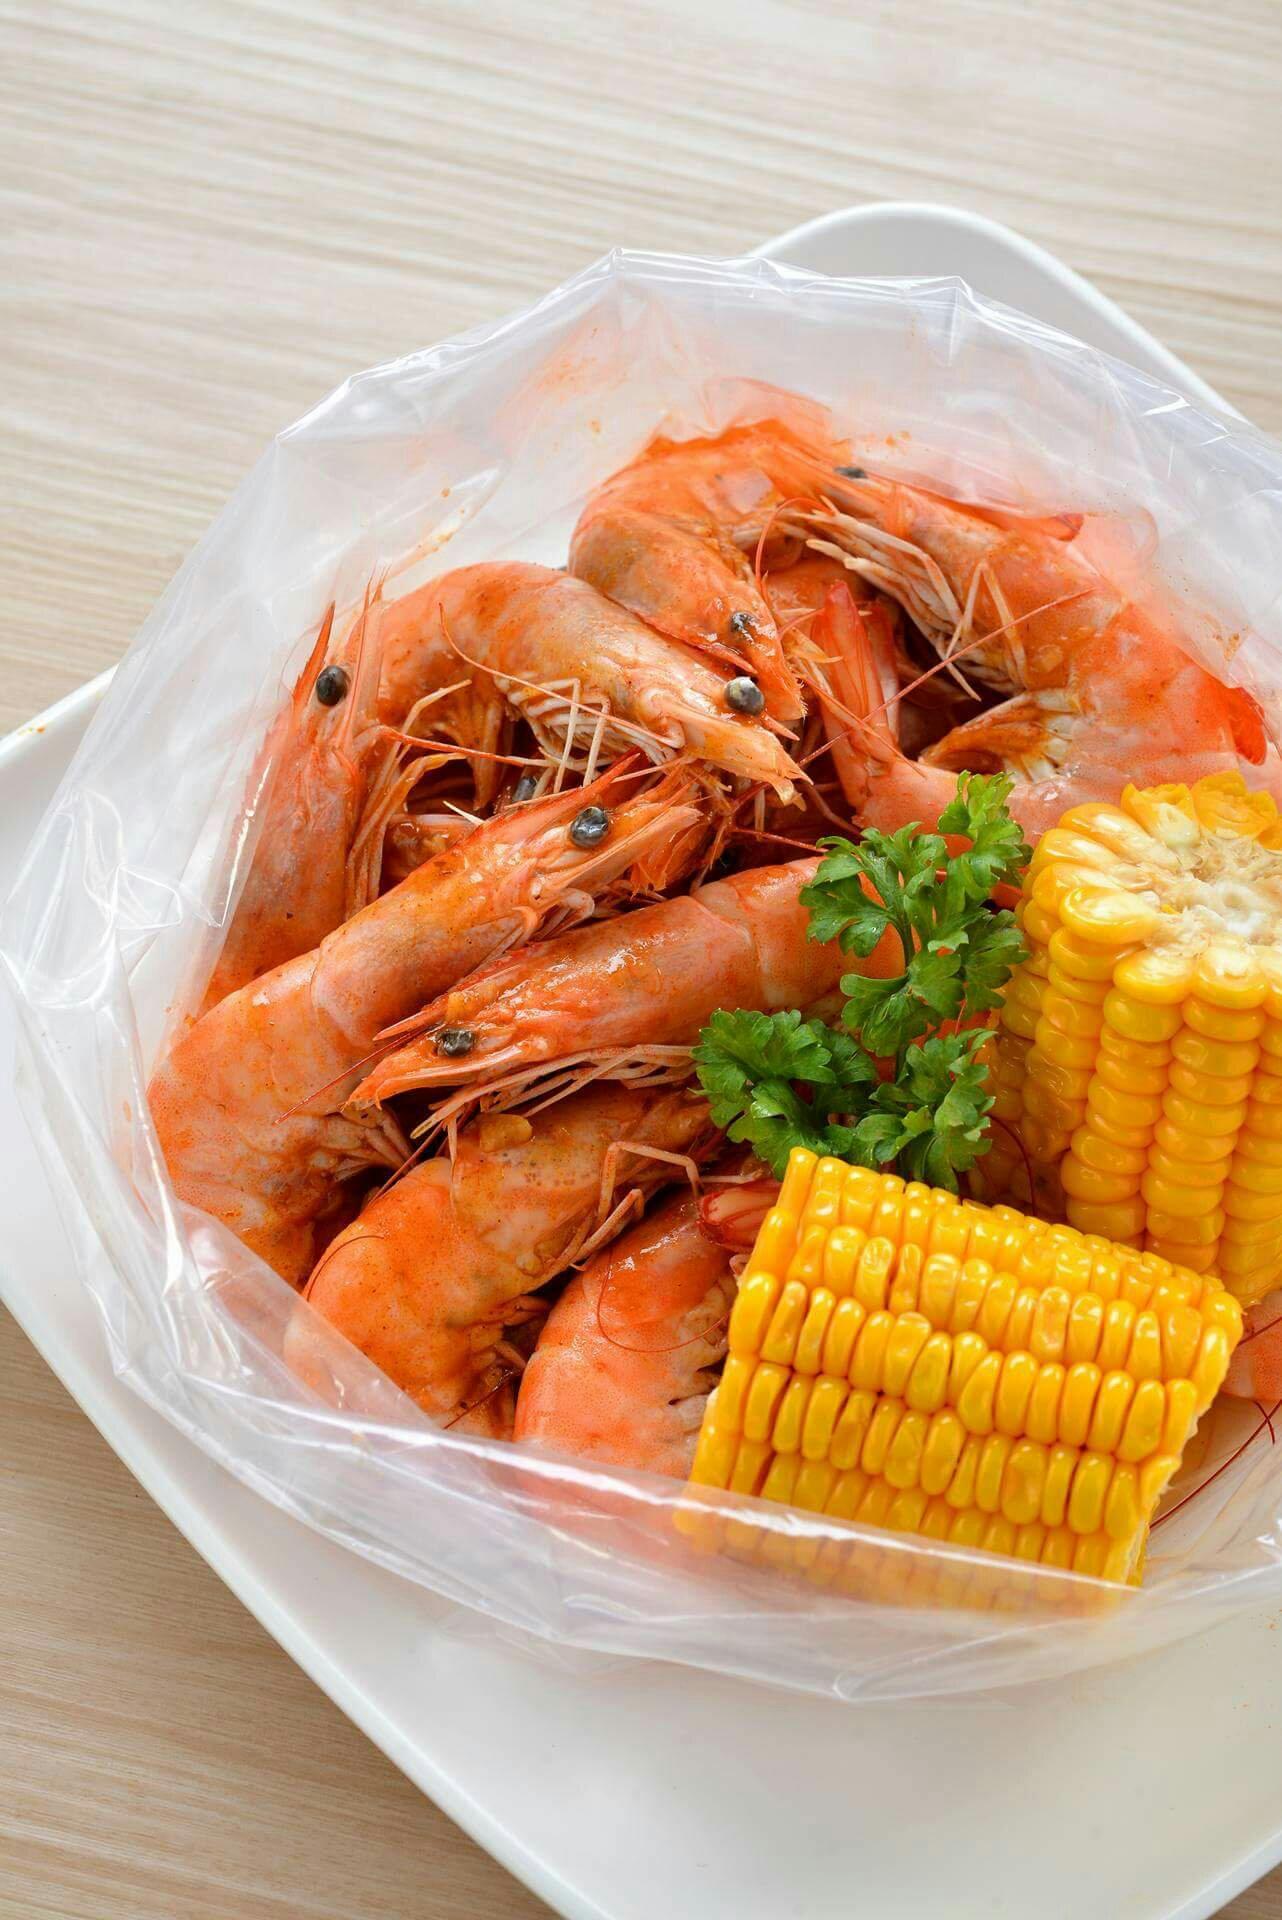 Choobi Choobi Shrimp Boil